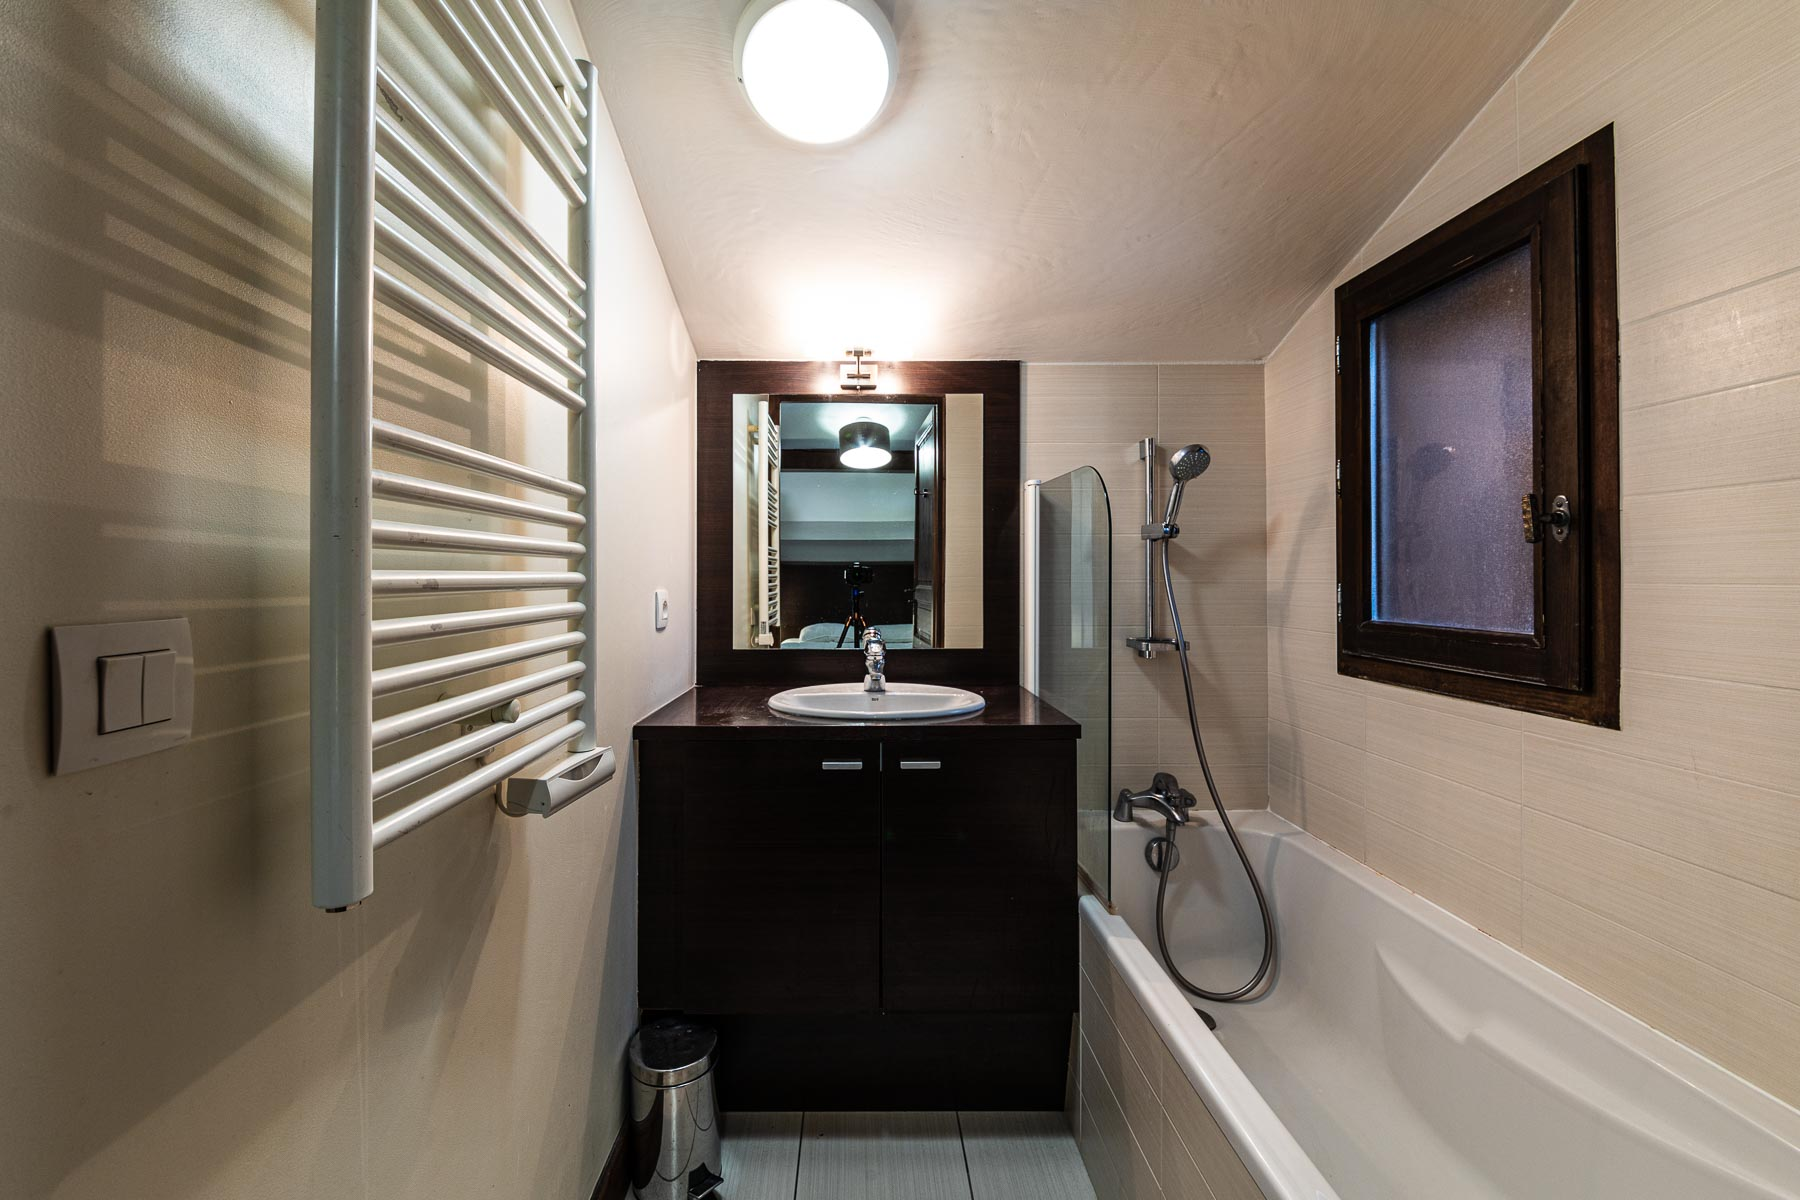 Ferme Emiguy Chalet 6 Bathroom